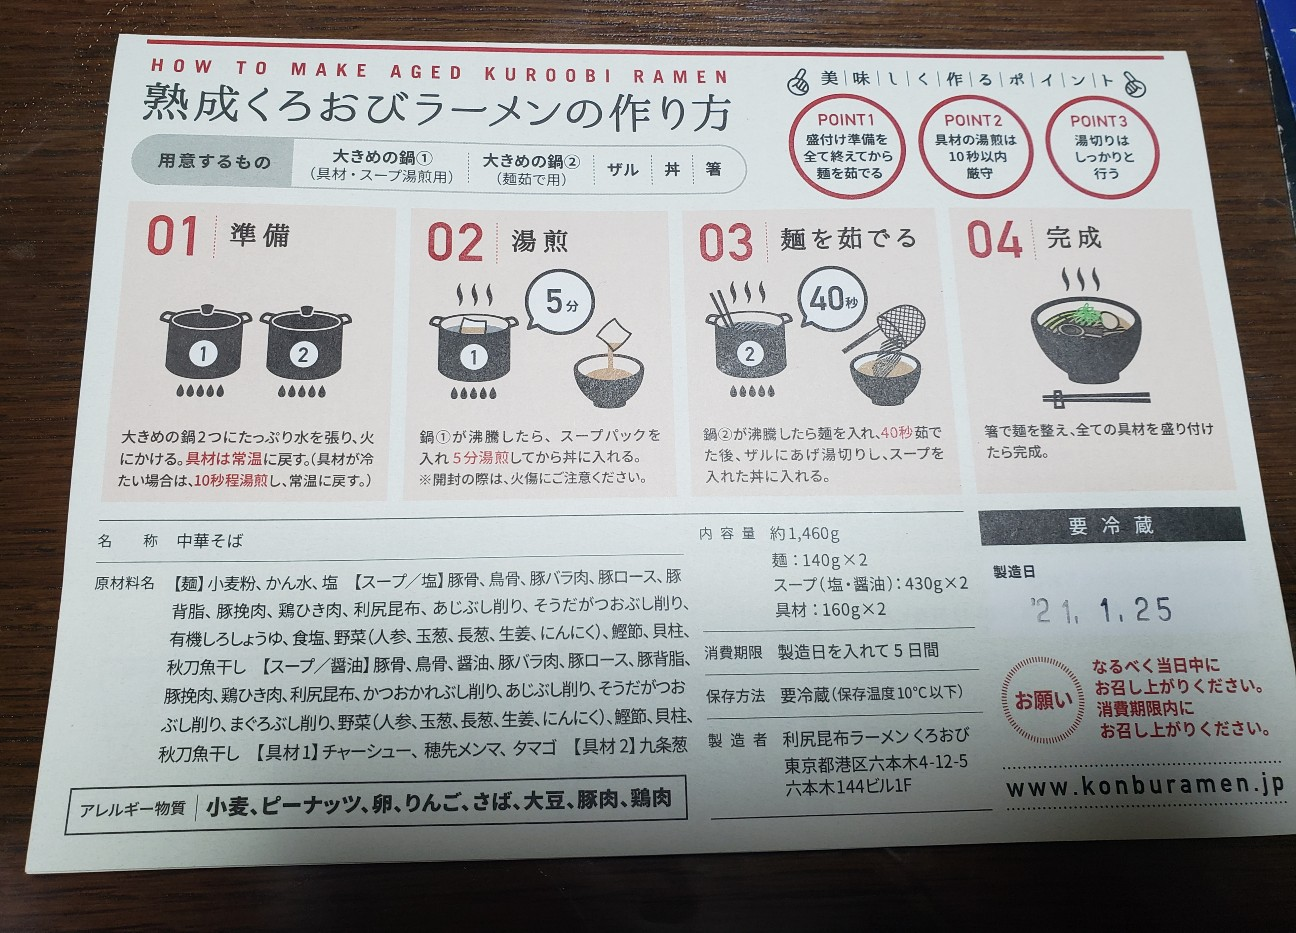 f:id:tt-suzukiit:20210126201159j:image